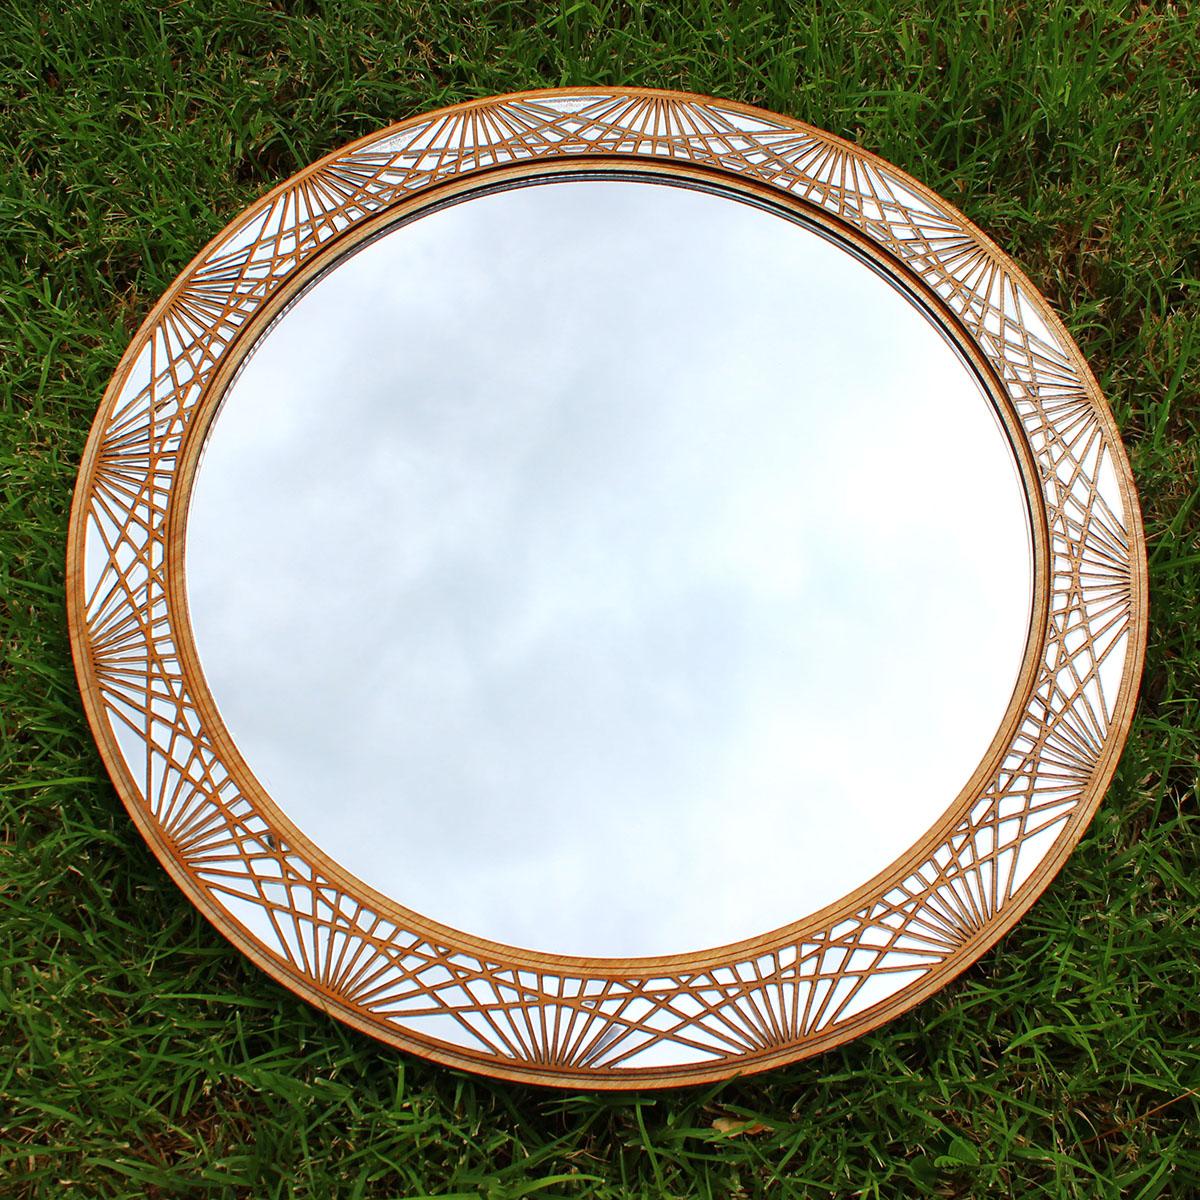 Mirror 1 Front